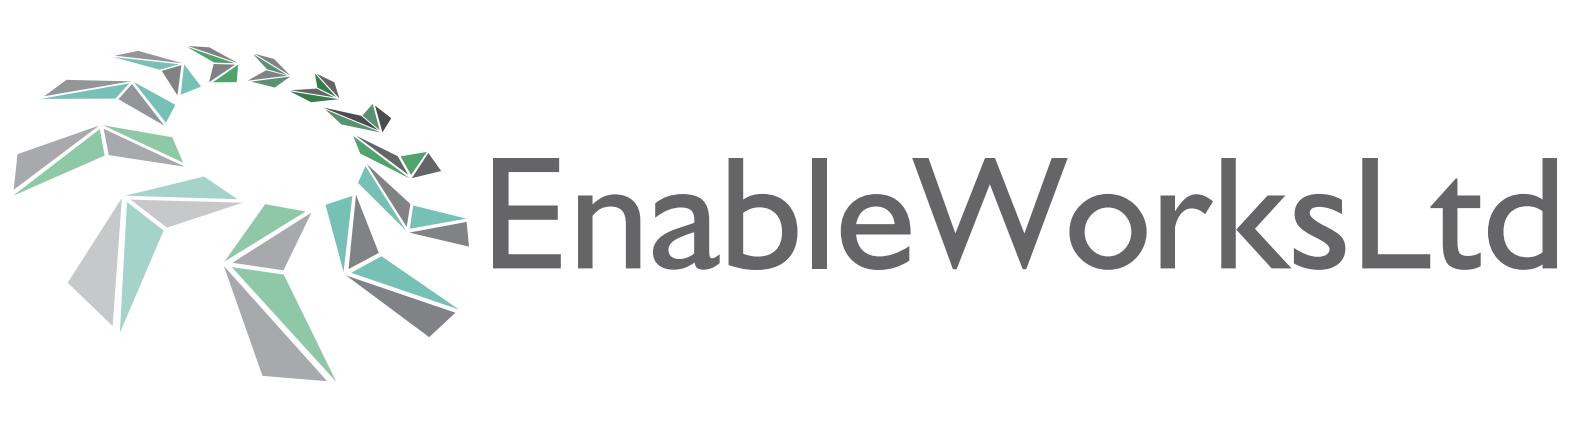 Enableworks logo